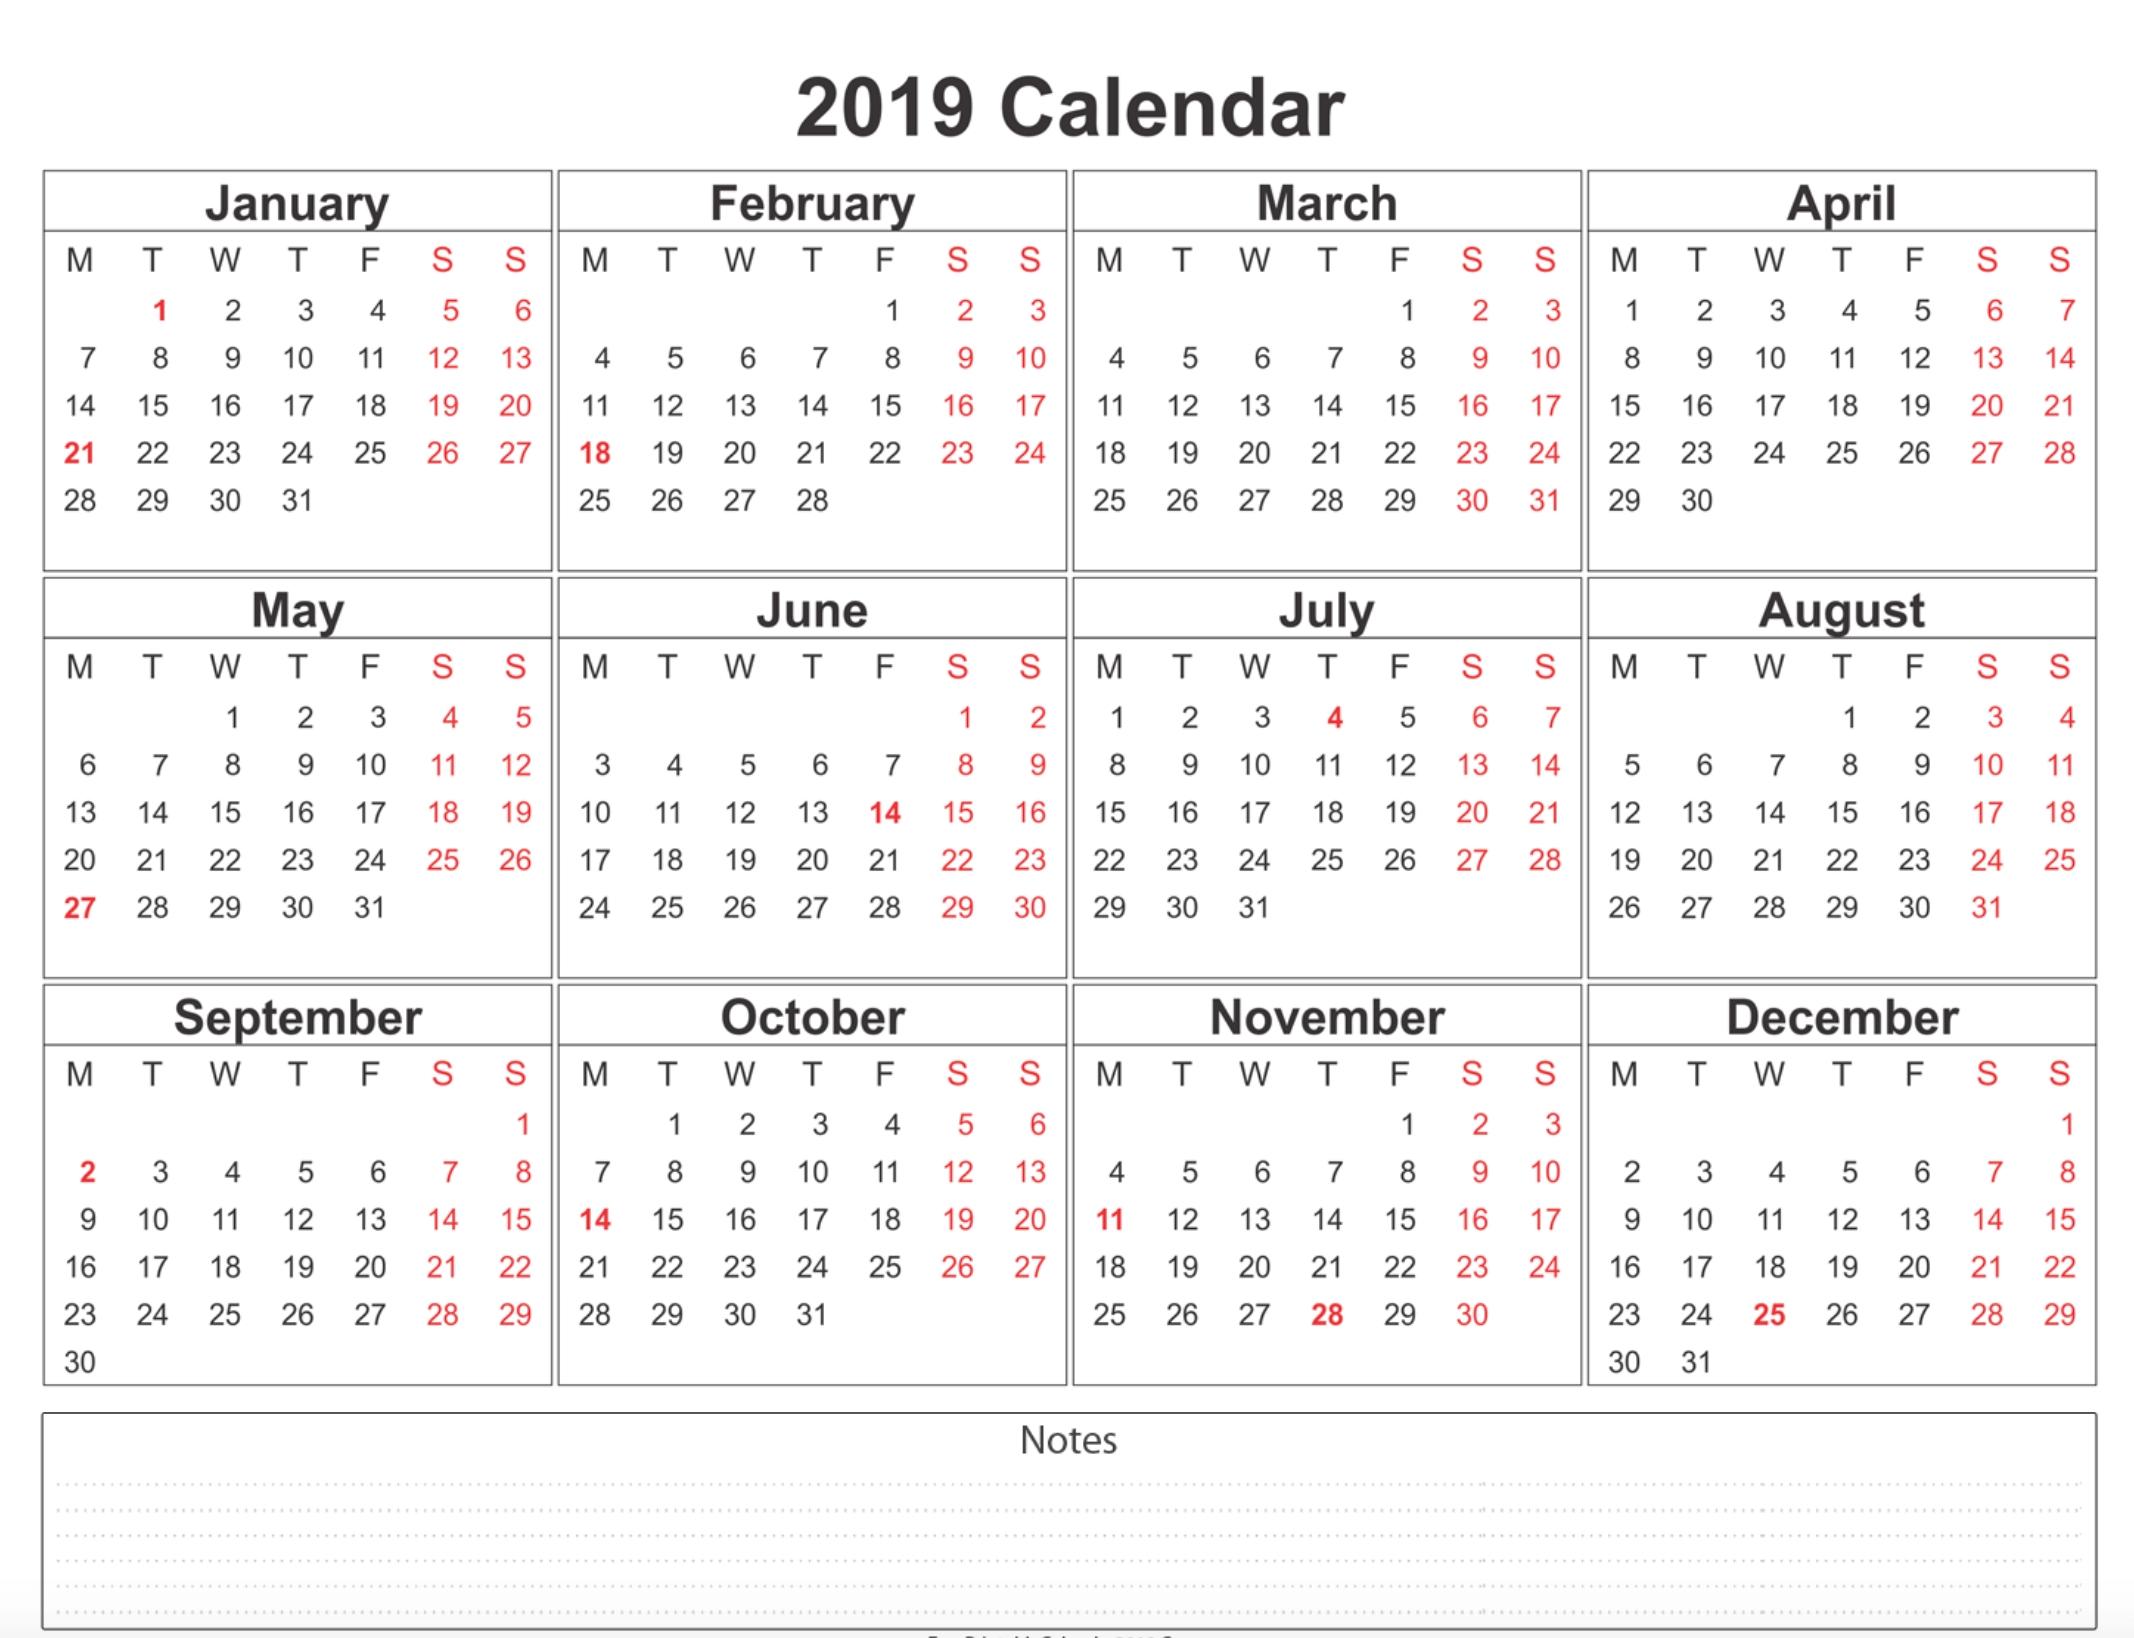 Free Blank Printable Calendar 2019 With Holidays Template Word in Weekly Free Print Calendar 2019 2020